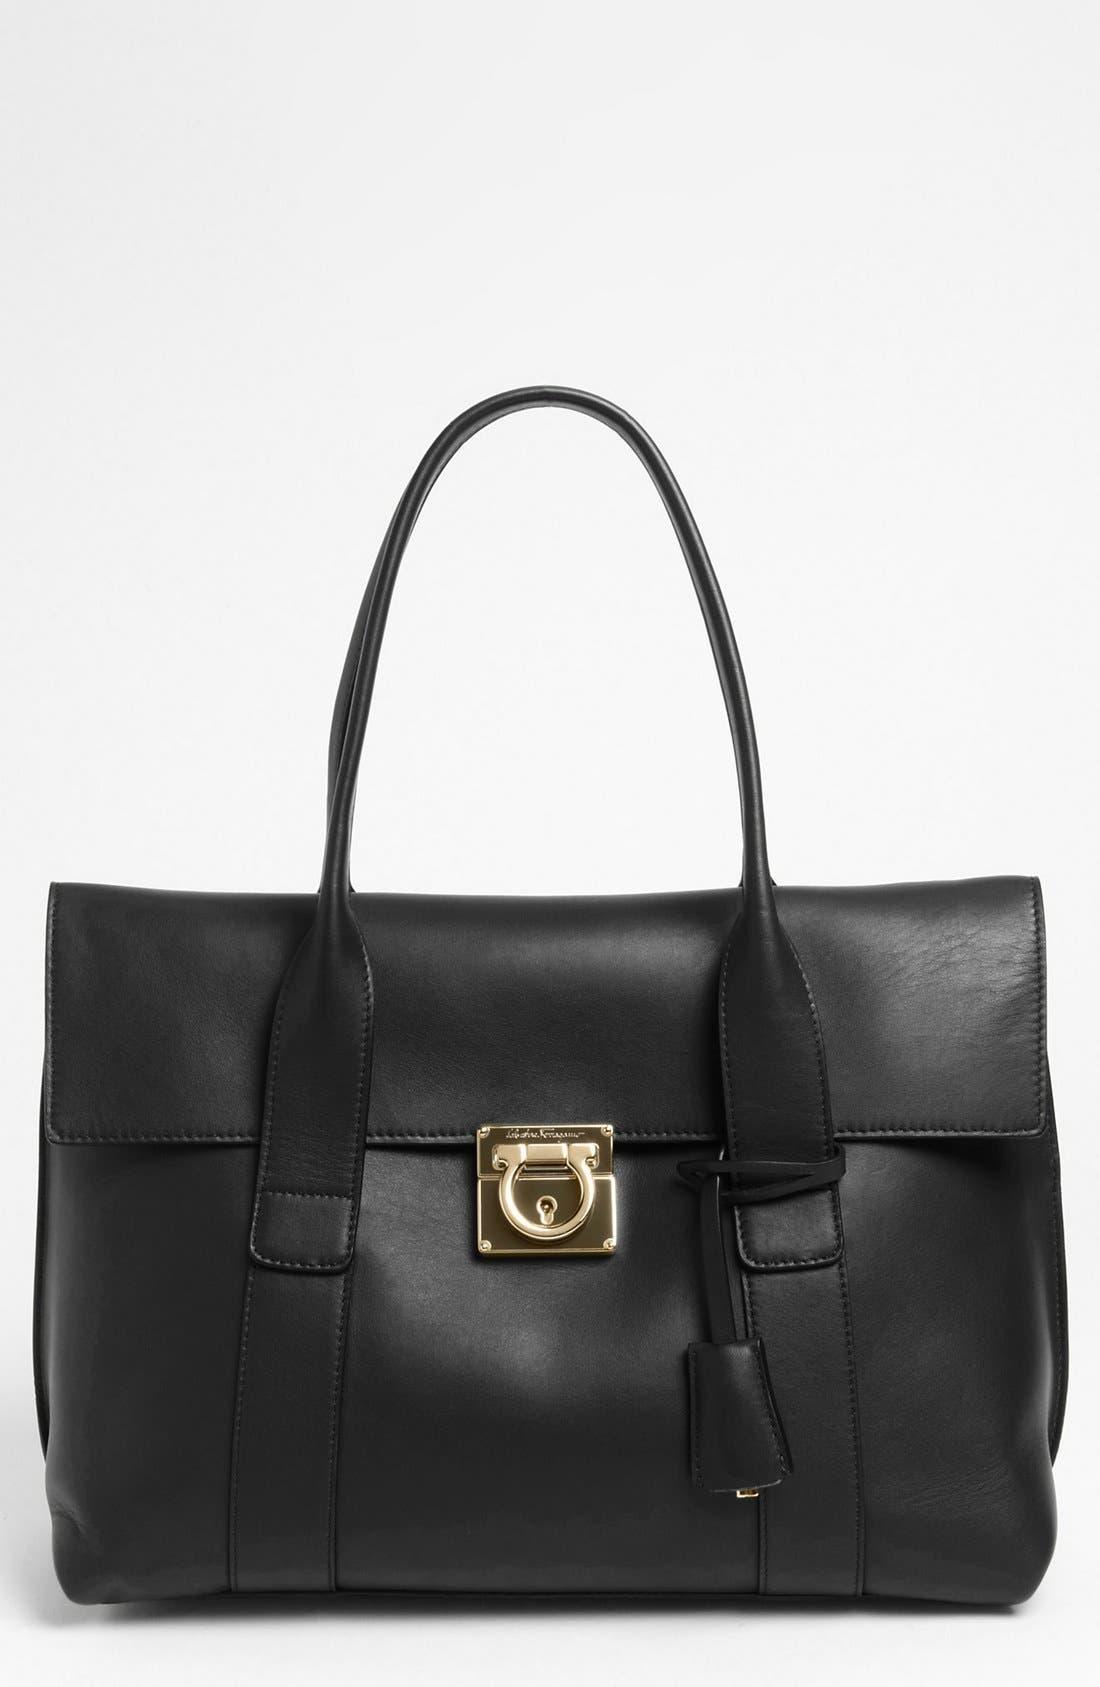 Alternate Image 1 Selected - Salvatore Ferragamo 'Sookie' Leather Shopper